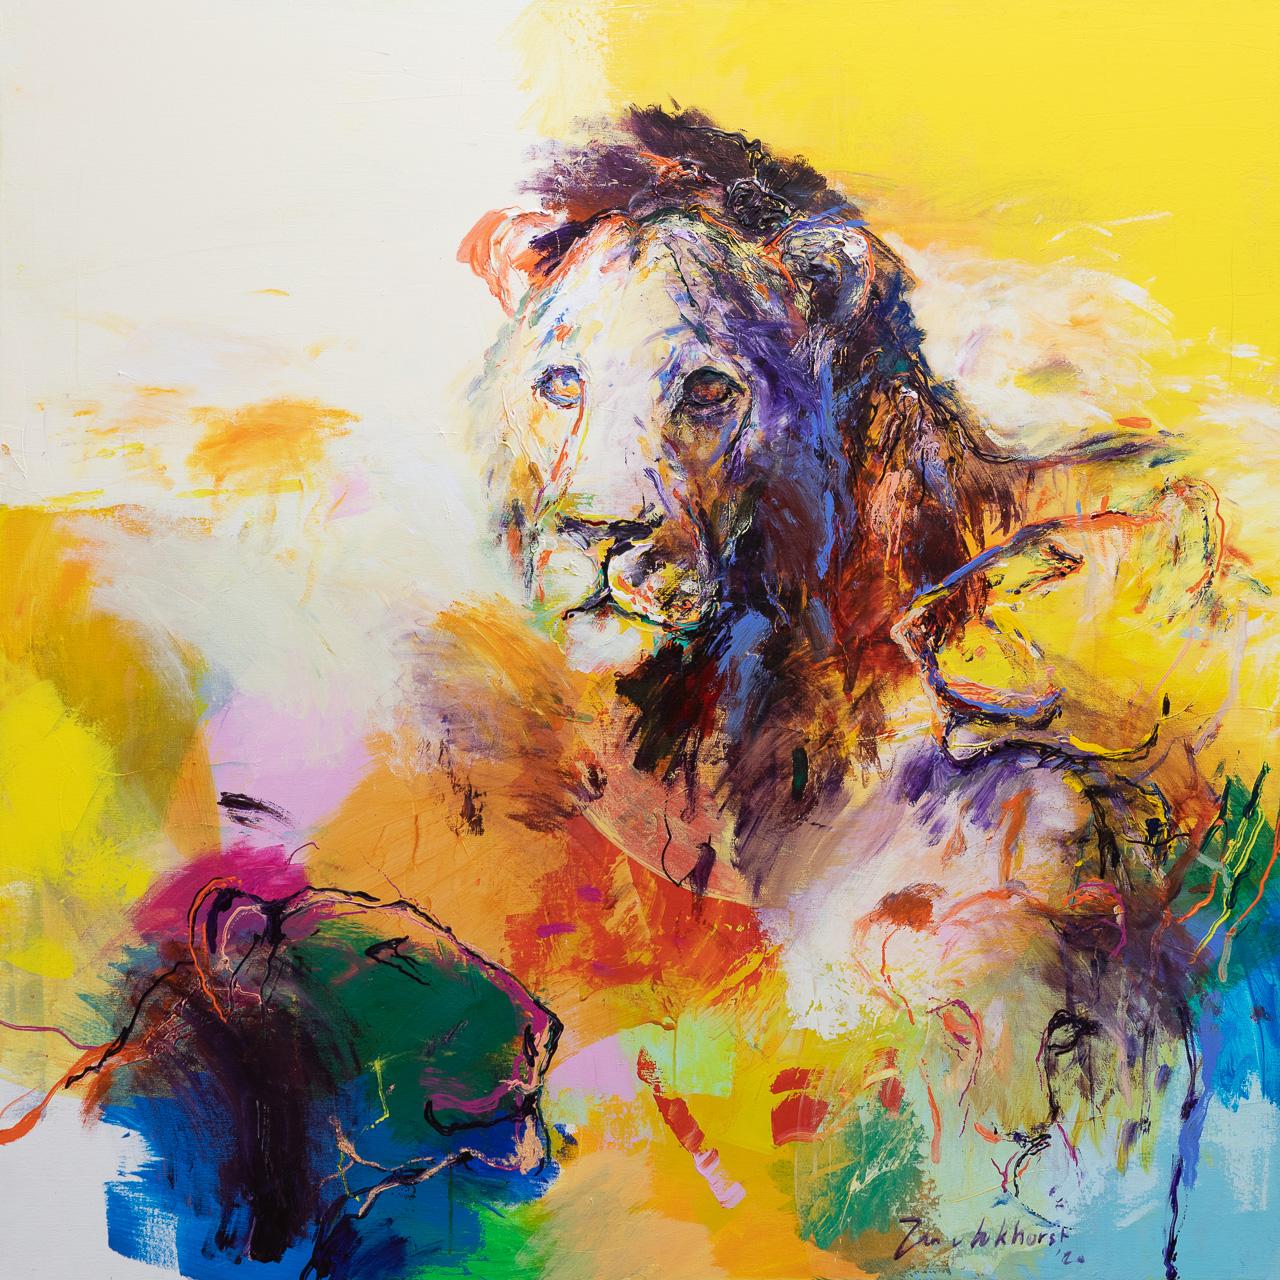 leeuwen-schilderij-LE35